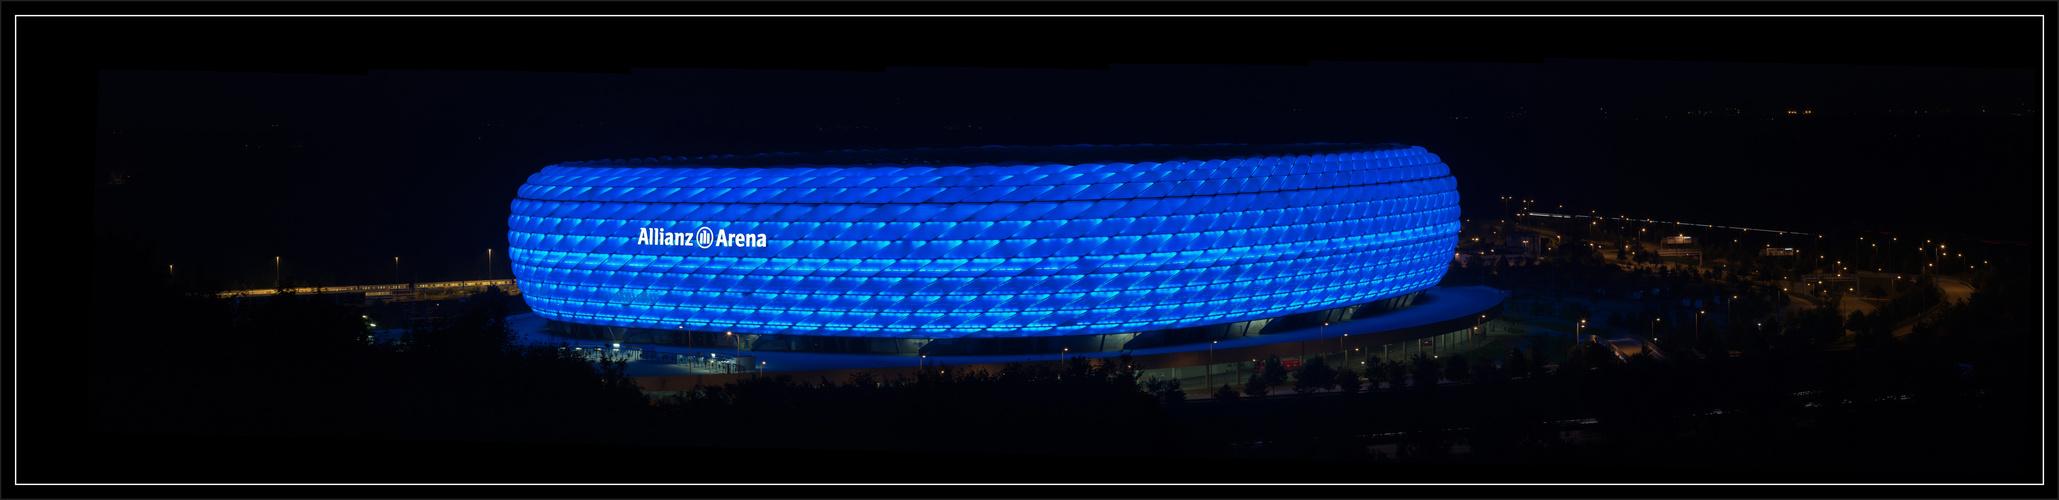 Alianz Arena blau